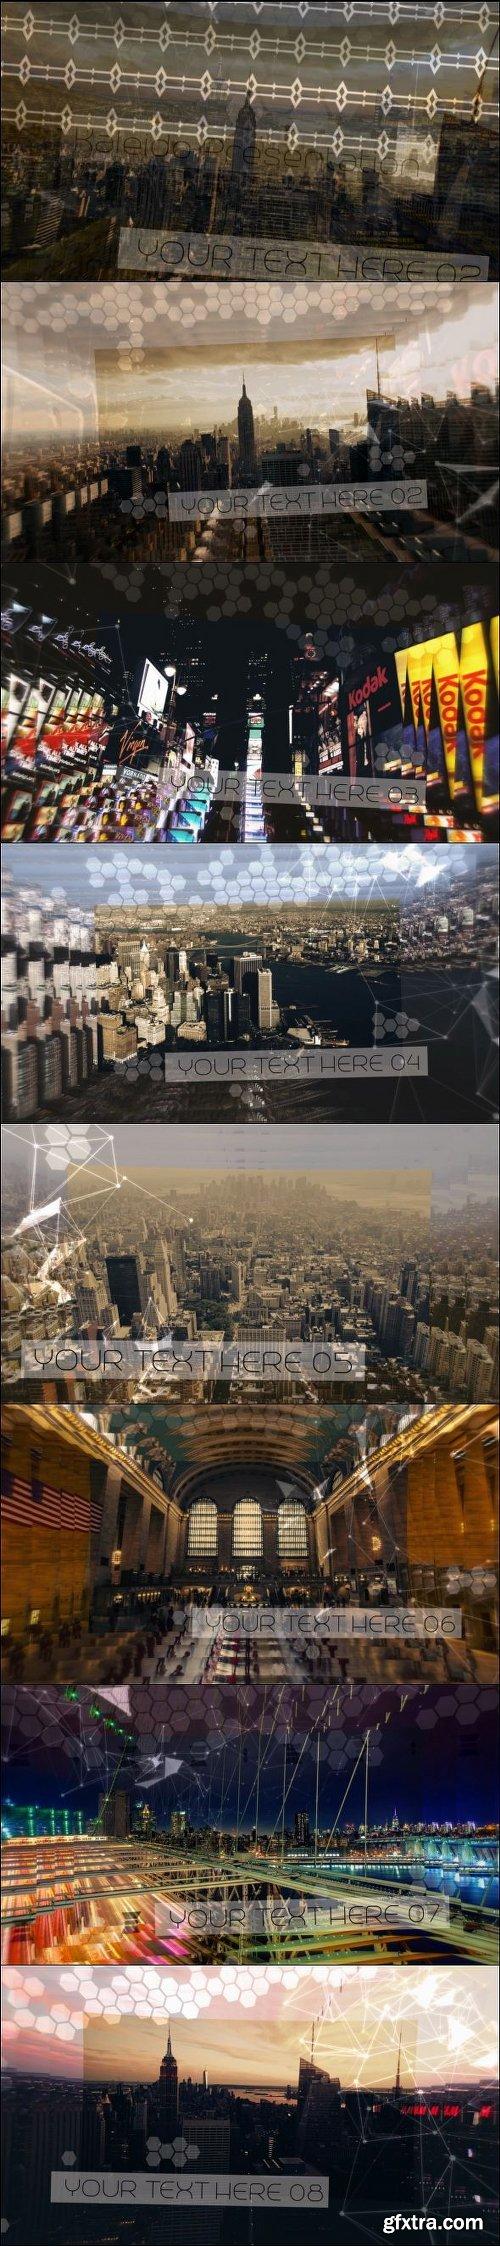 Kaleidoscope Photo Presentation